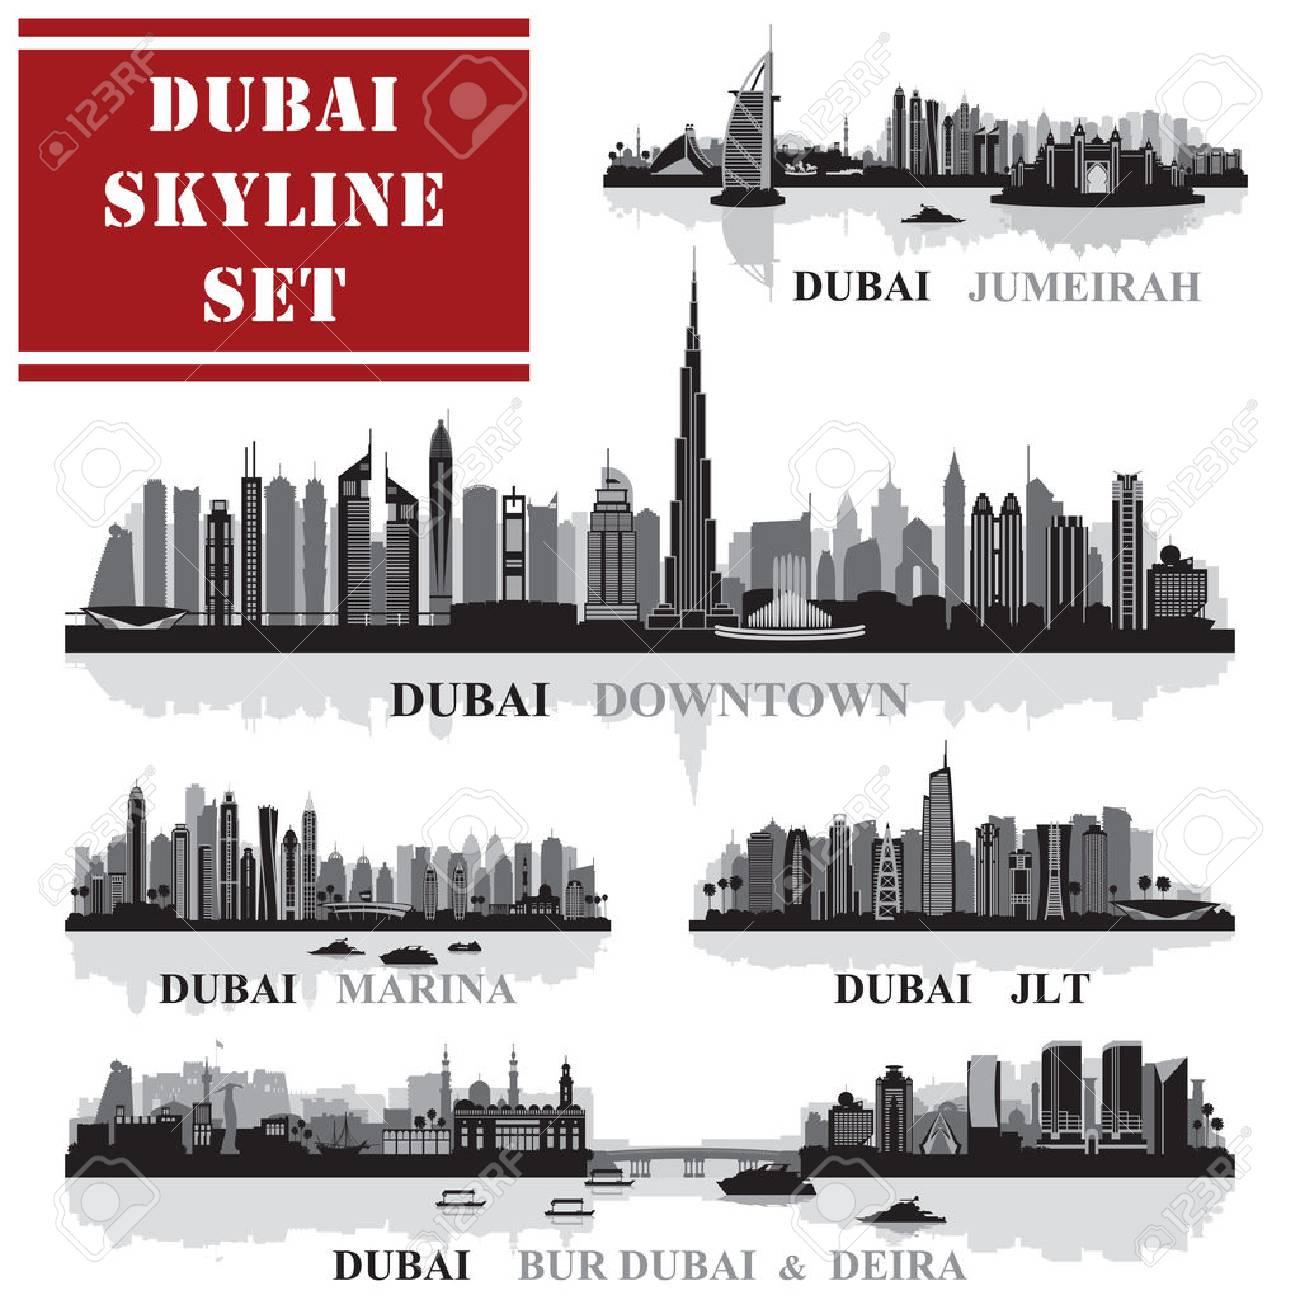 Set of Dubai districts, vector illustration - 55014789